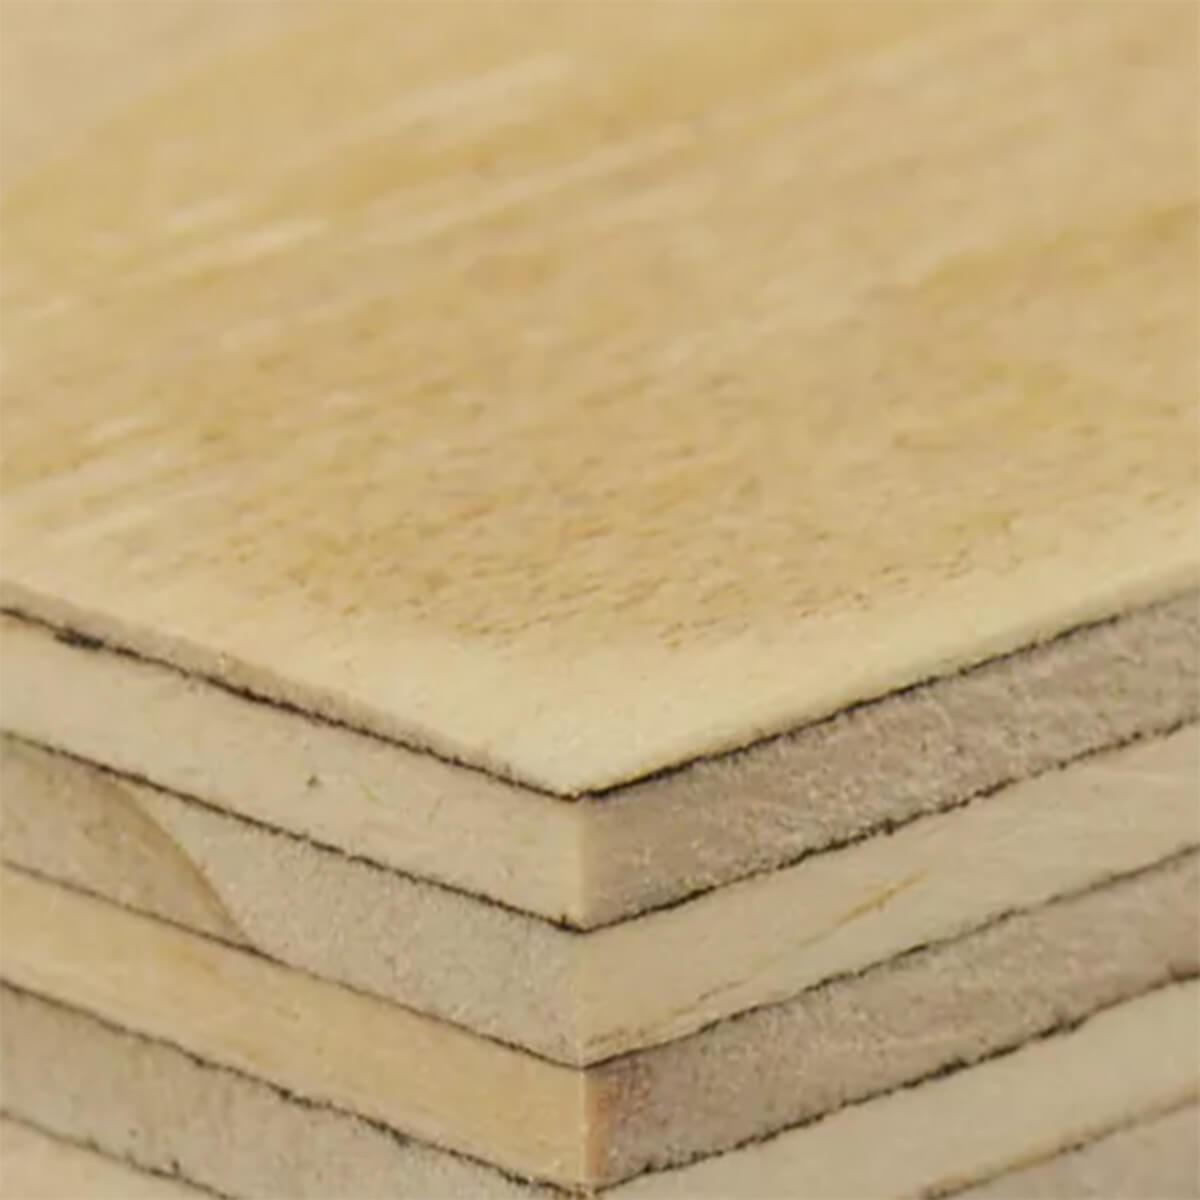 Sanded Fir G1S Plywood - 4 X 8 - 11 MM